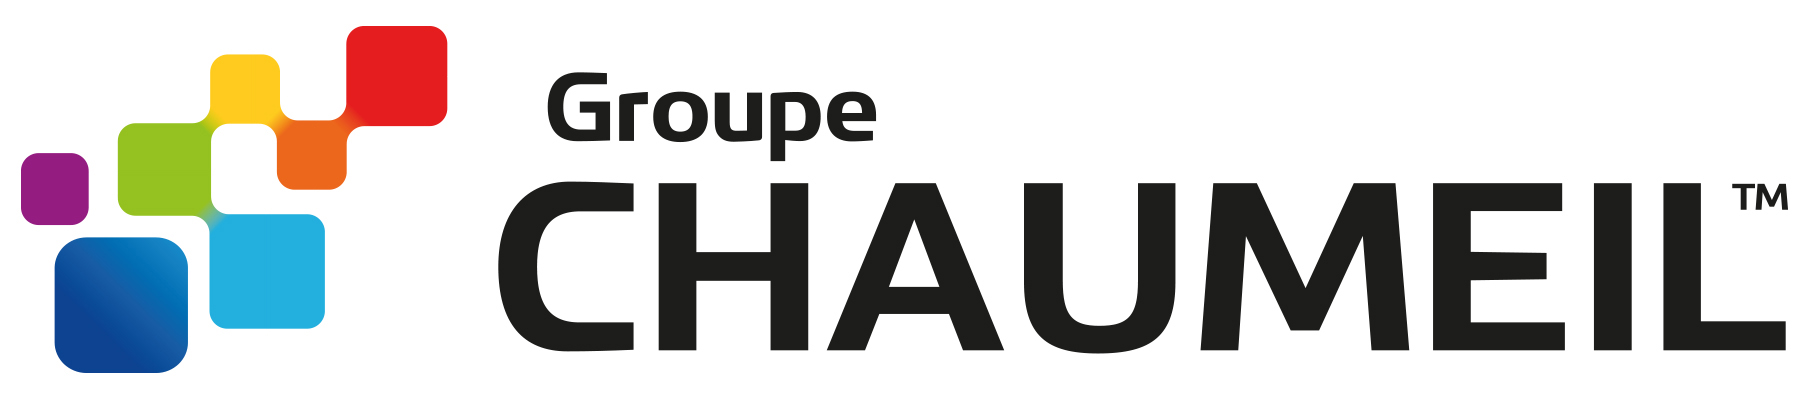 chaumeil-logo-2016-hori_5f7b22cf1db29.jpg